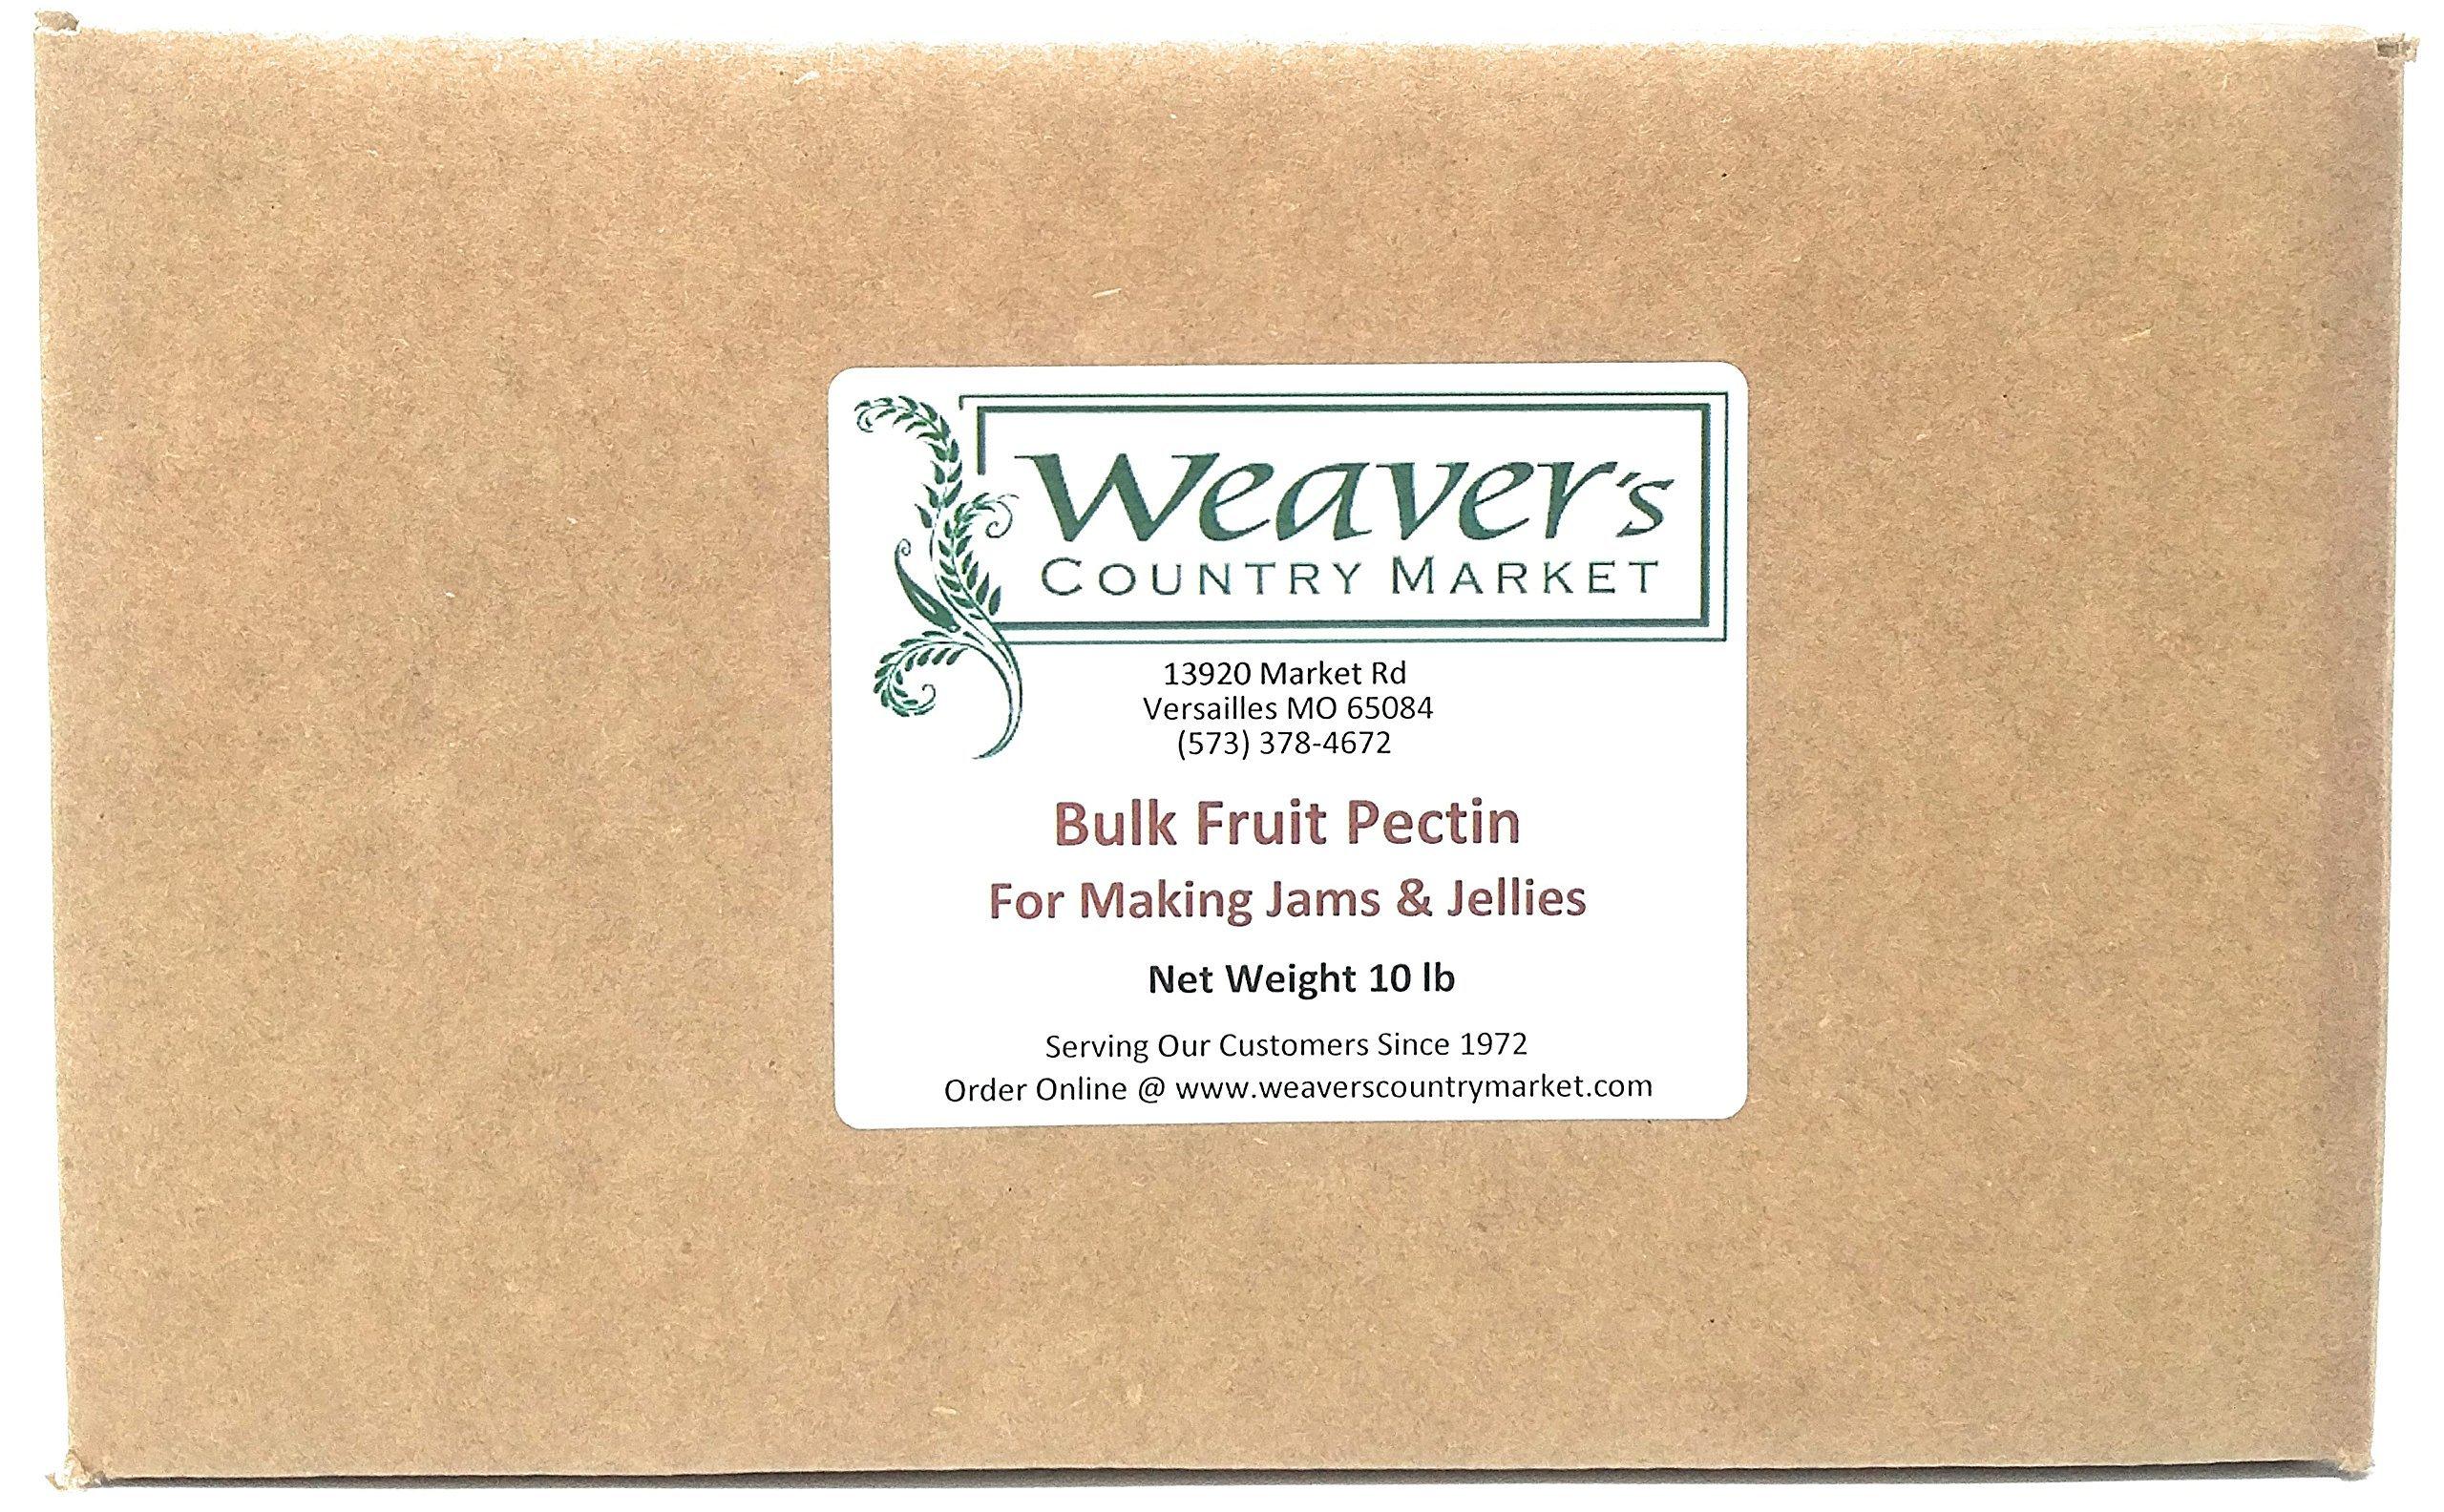 Weaver's Country Market Bulk Fruit Pectin Mix for Making Jams & Jellies (10 Lb. Plastic Bag) by Weaver's Country Market (Image #3)